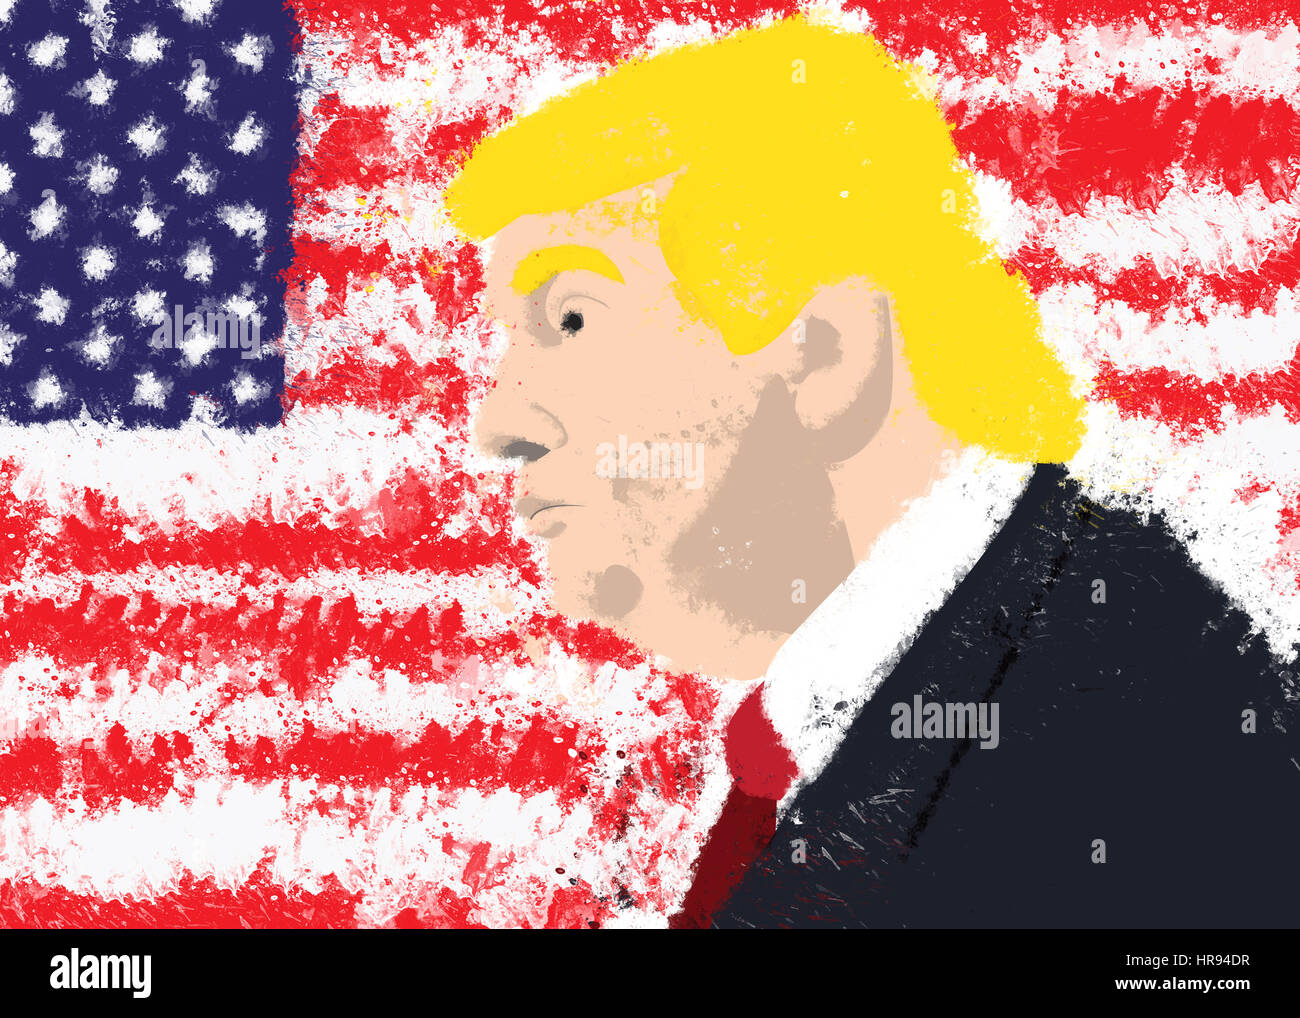 Donald Trump, president of USA - Stock Image